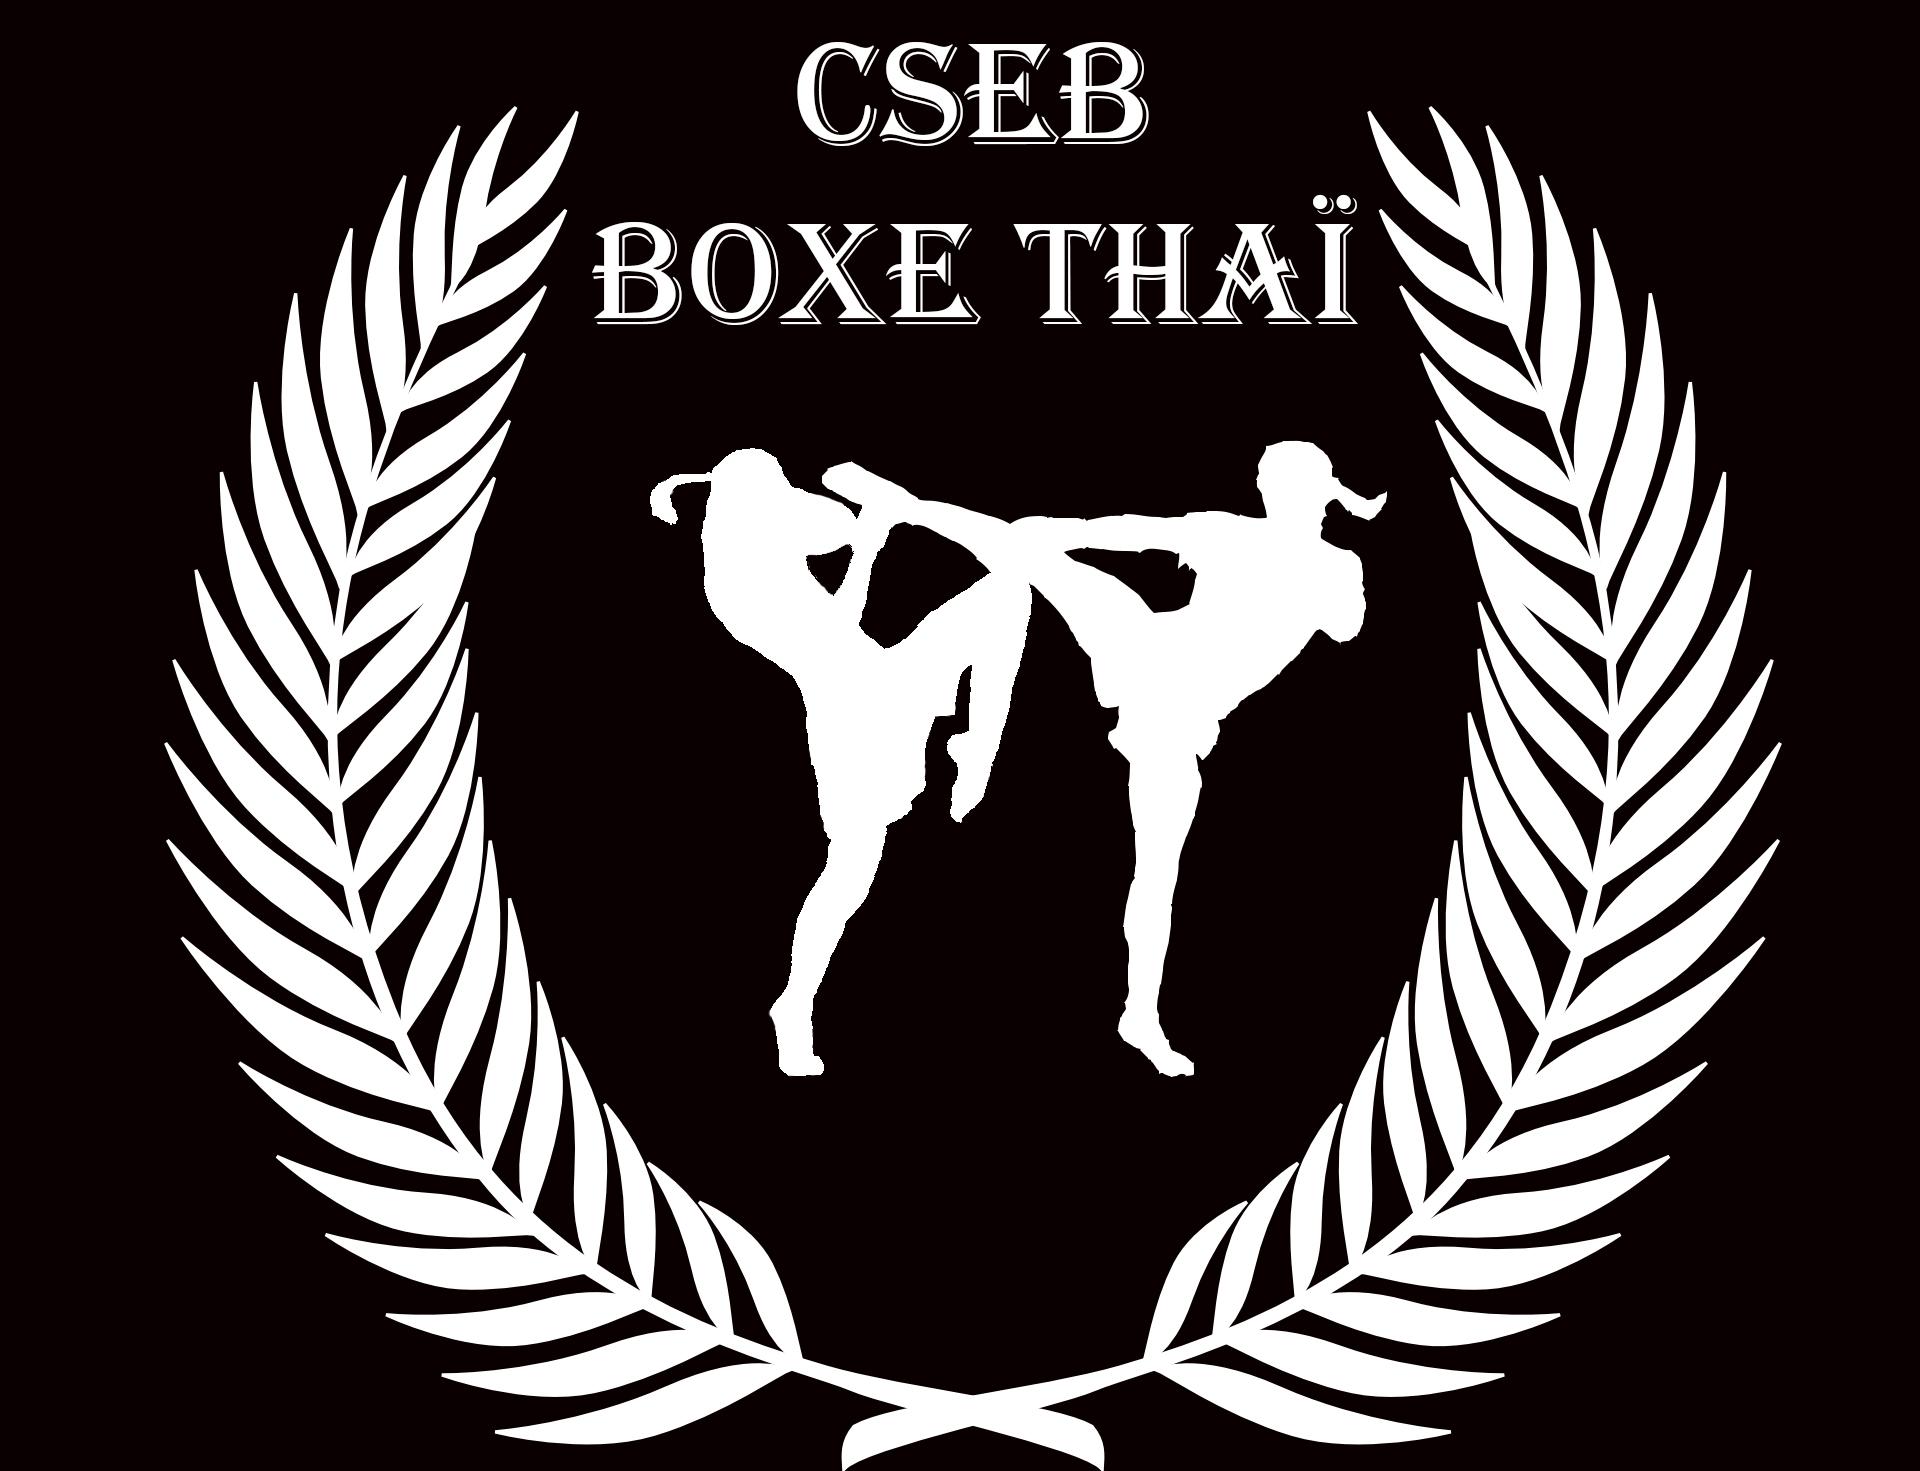 CSEB Boxe Thaï